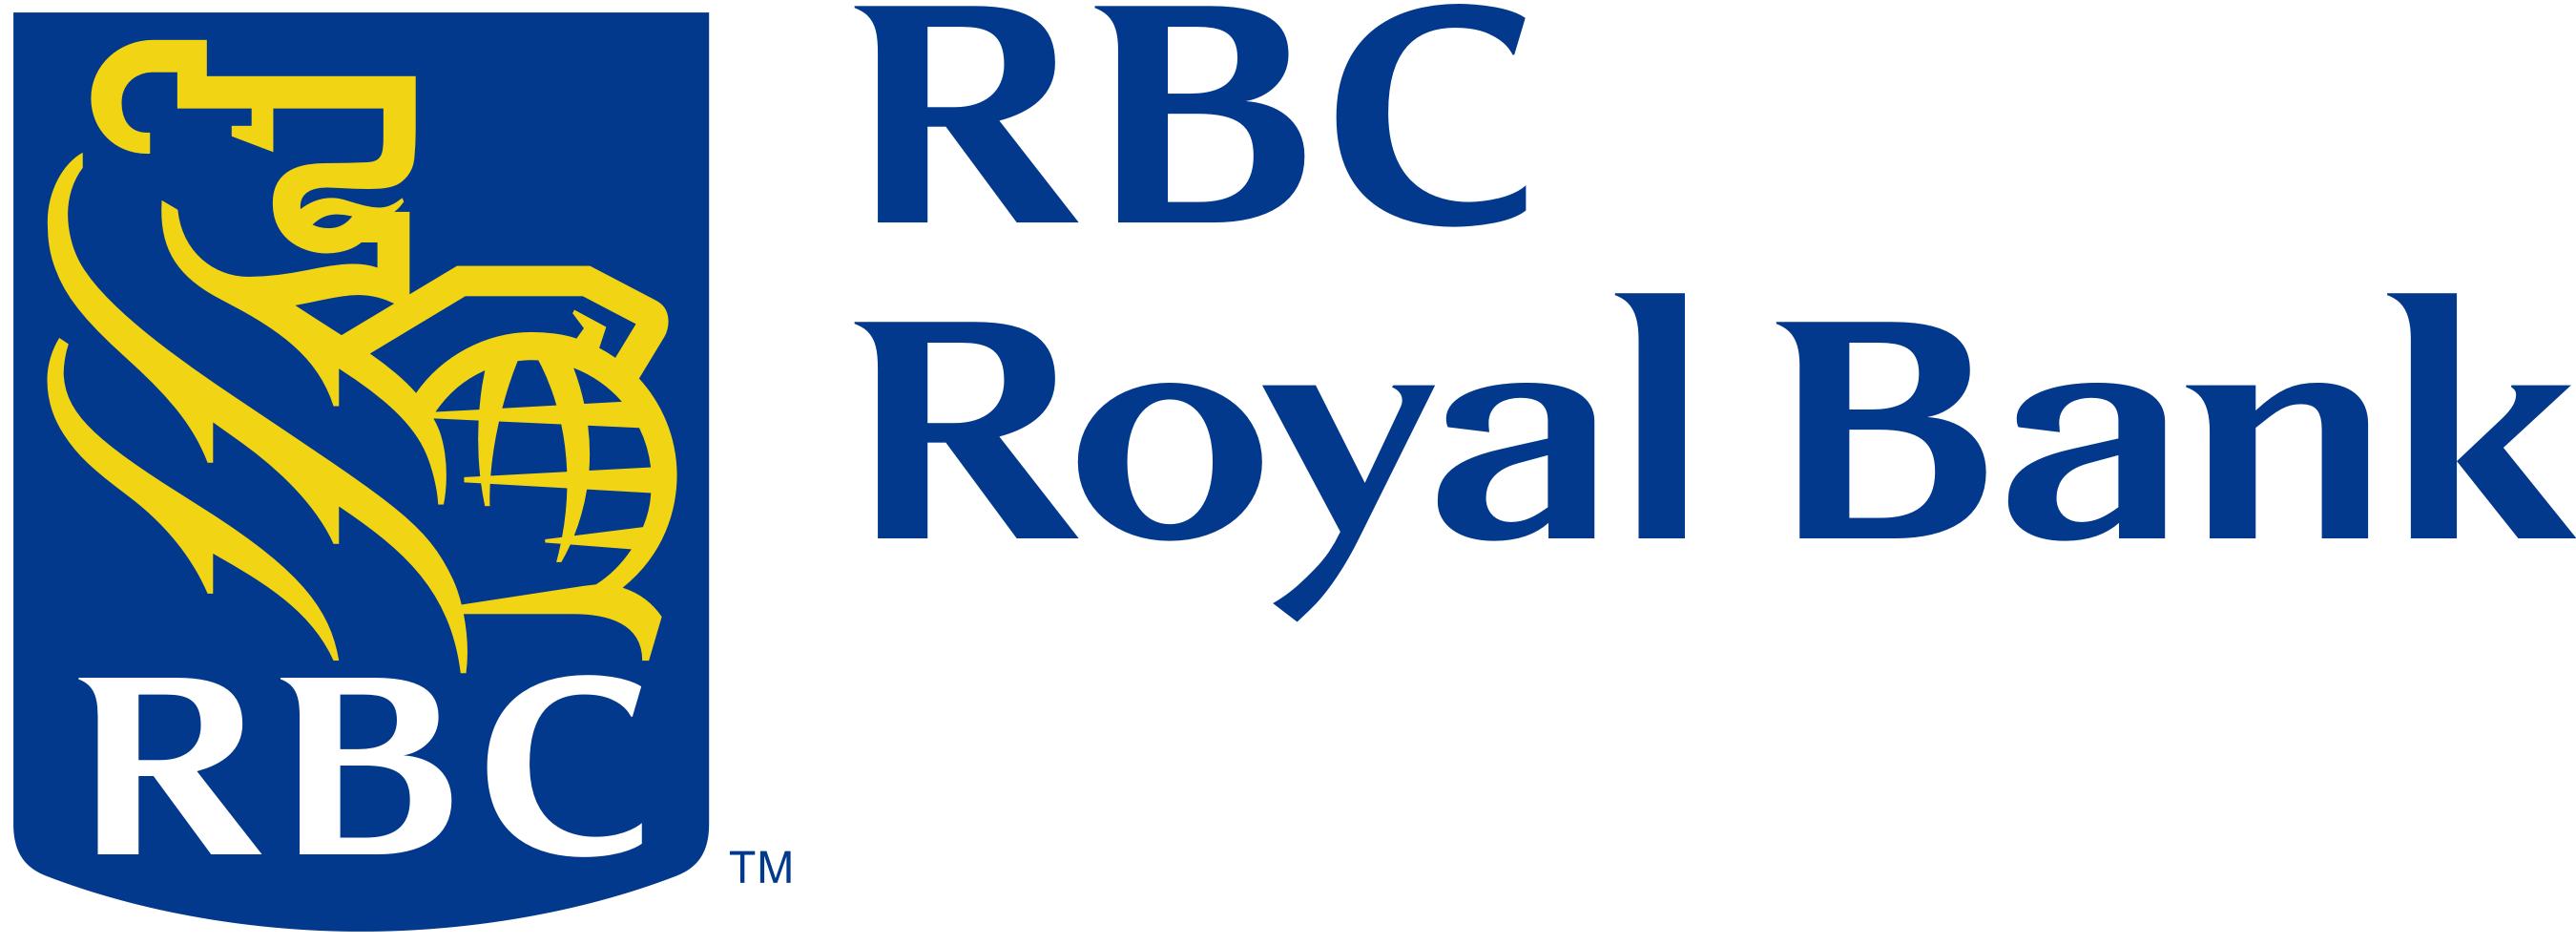 rbc-royal-bank-logo-1